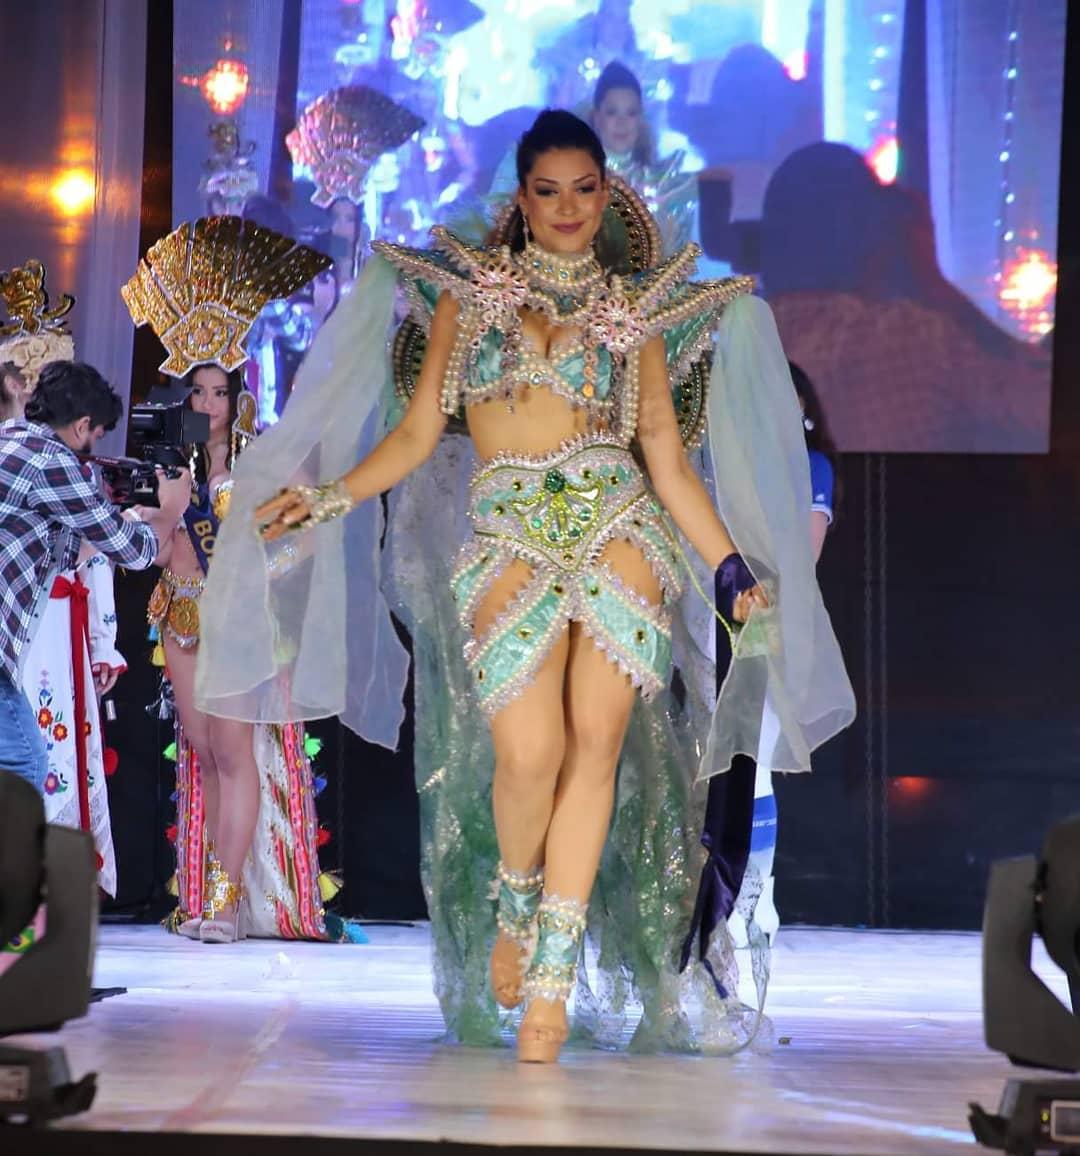 gleycy correia, miss brasil continentes unidos 2018. - Página 5 41523310